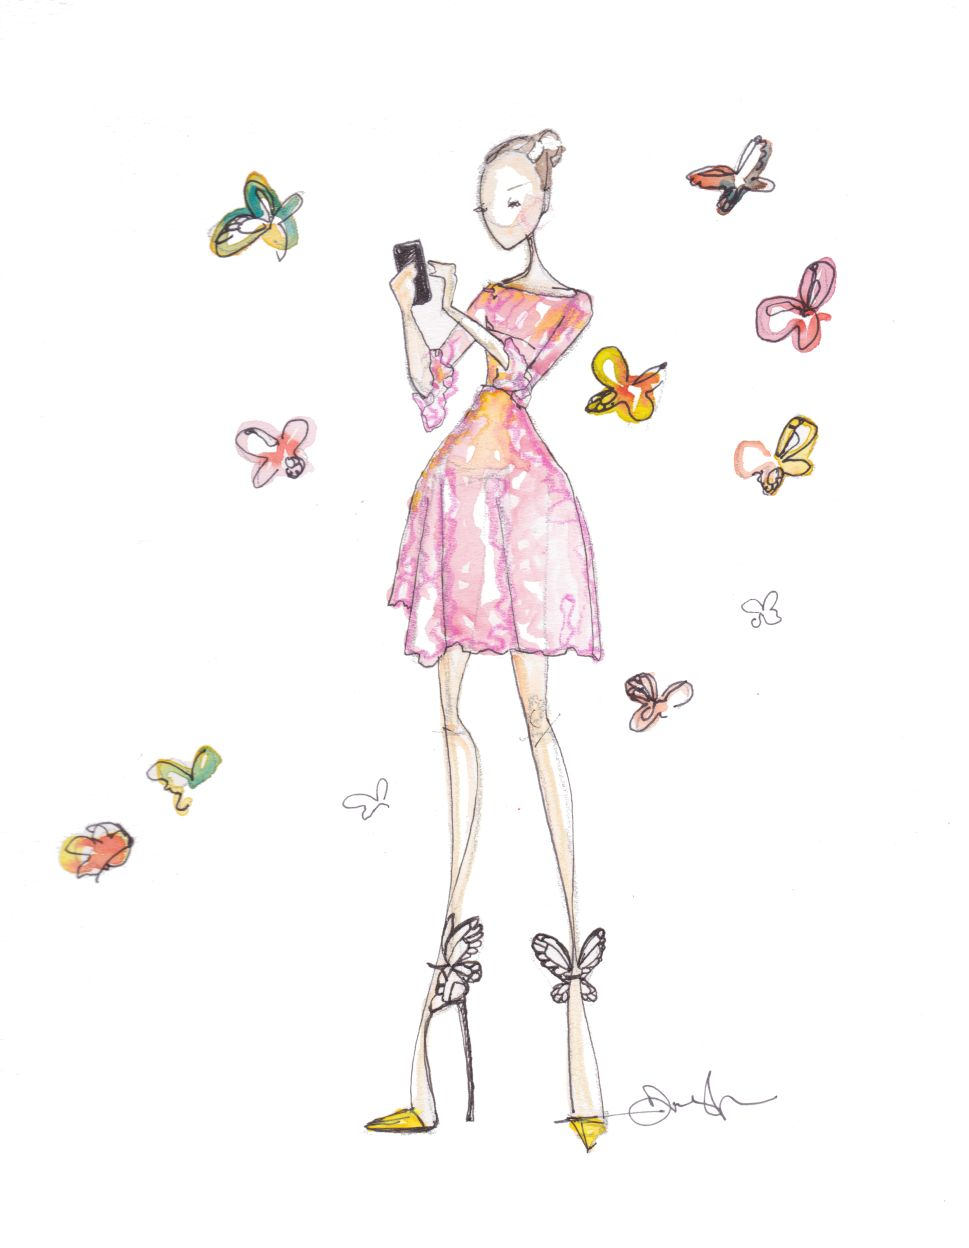 This Fashion Illustrator Challenges Women to Improve Their Wardrobes